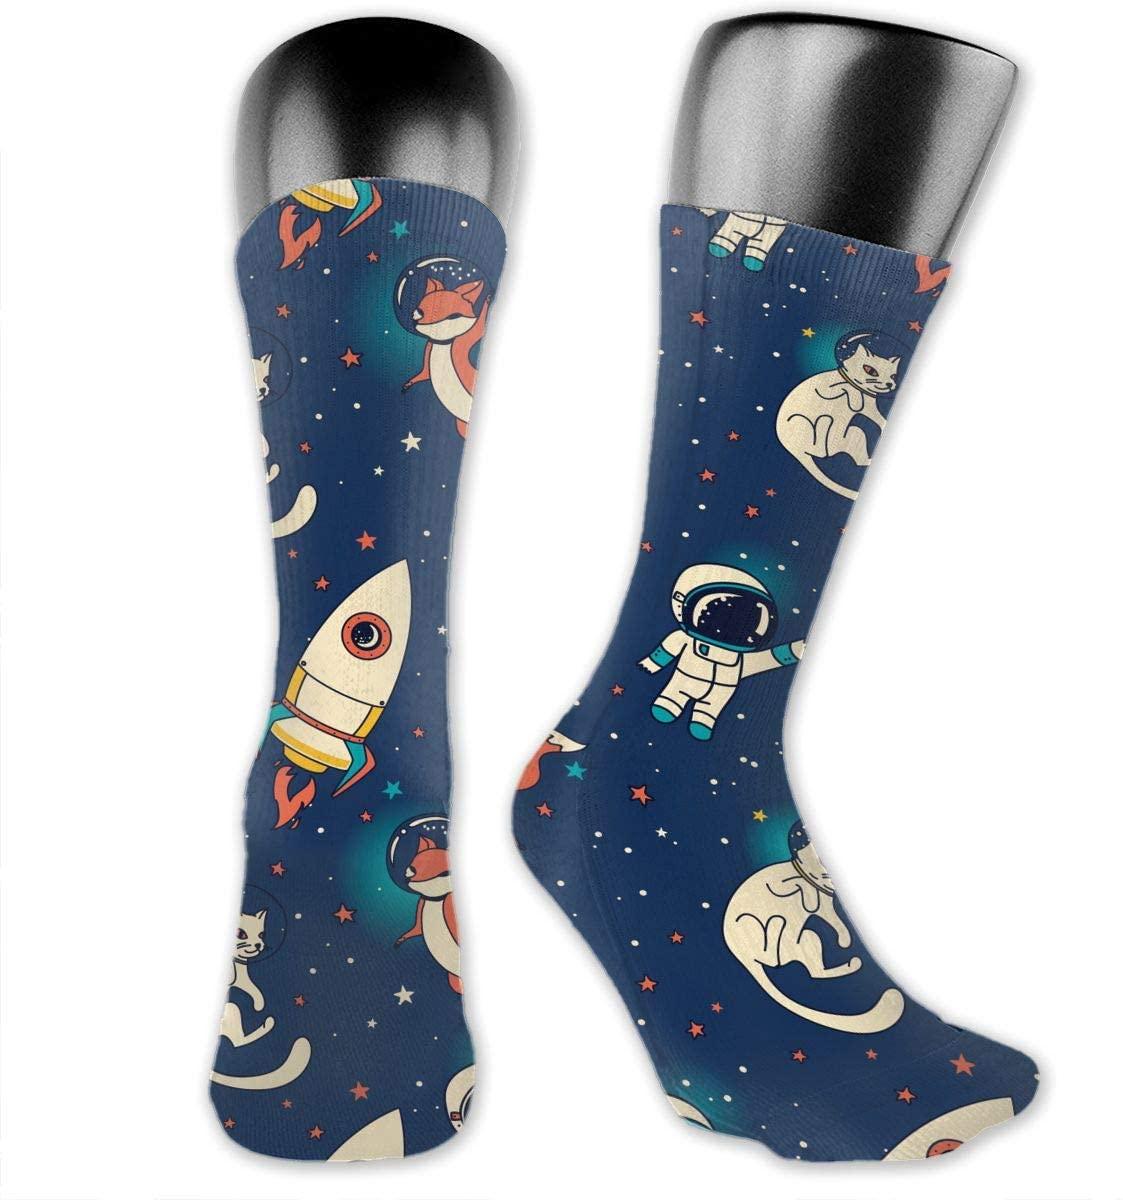 Cat Astronauts Unisex Outdoor Long Socks Sport Athletic Crew Socks Stockings